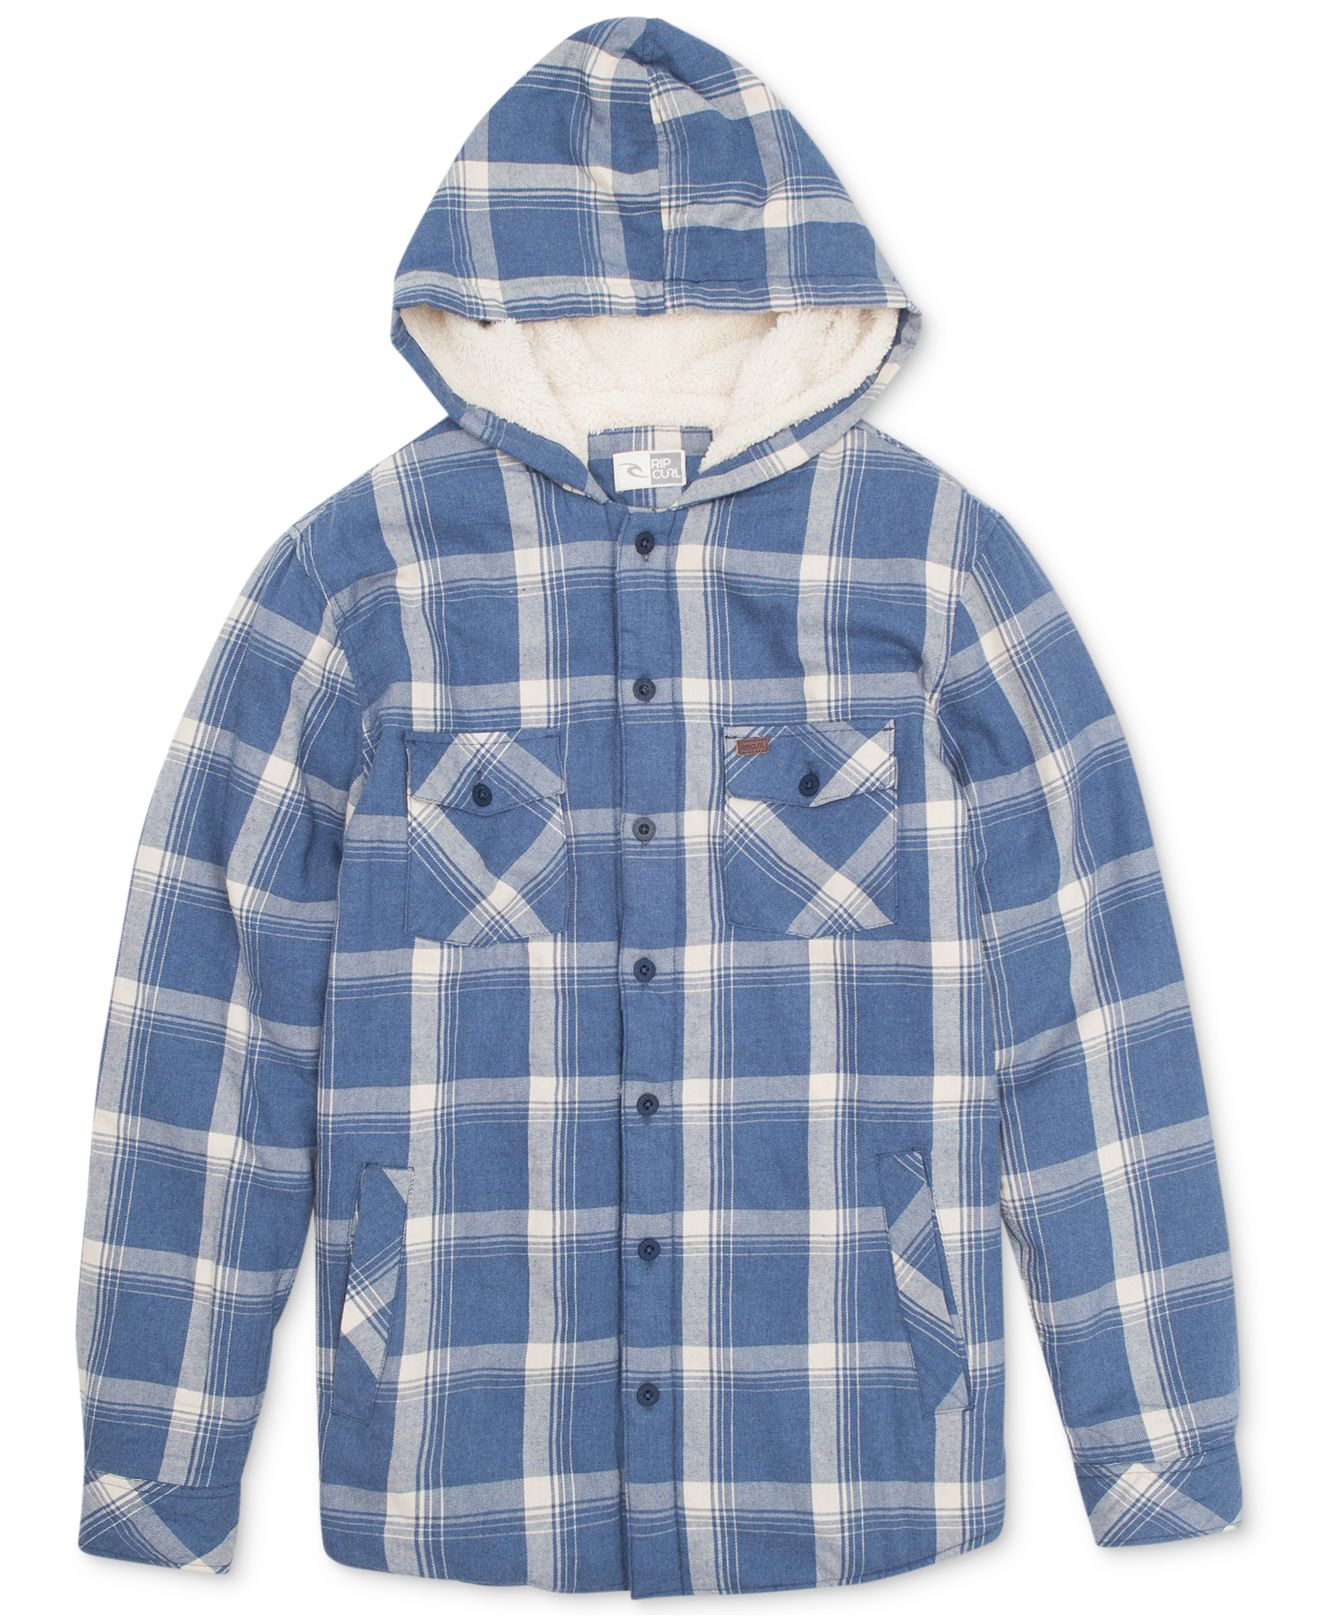 Rip curl hayward sherpa lined plaid shirt jacket in blue for Plaid shirt jacket mens